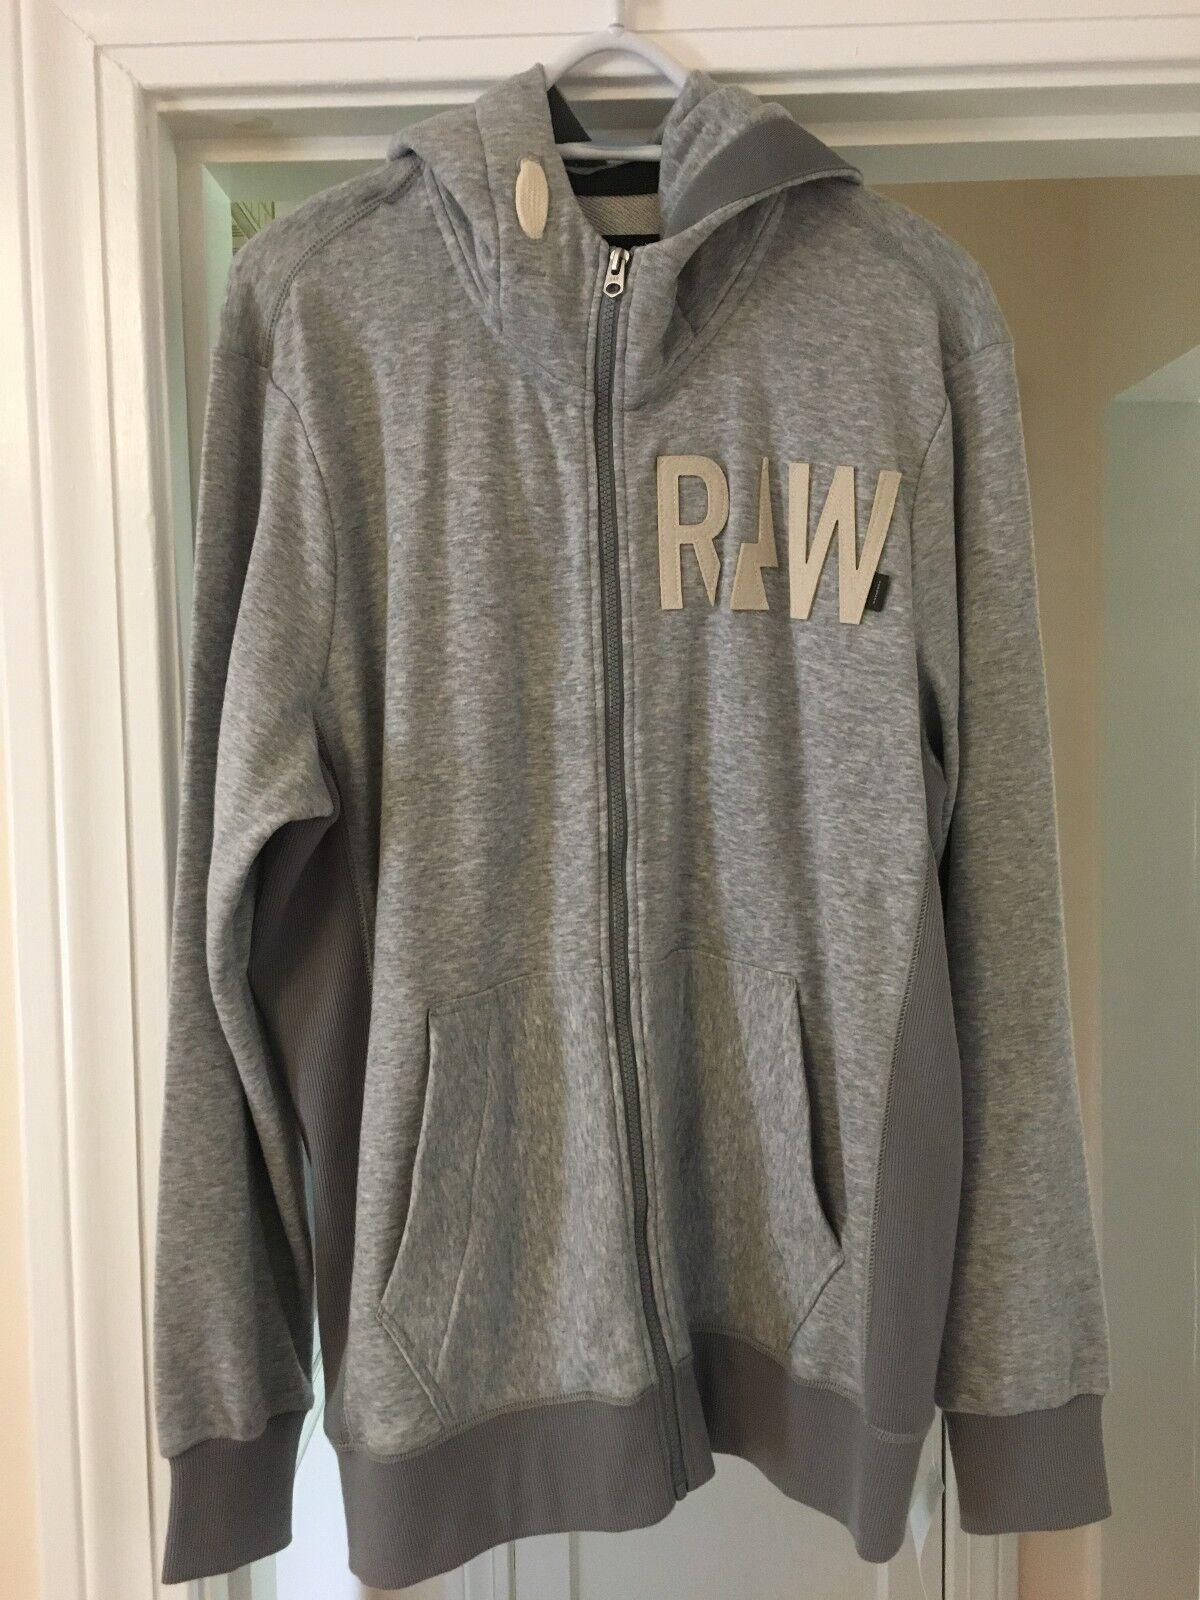 G Star Raw sweat suit set BNWT Hoodie Sz XL Pants Sz L